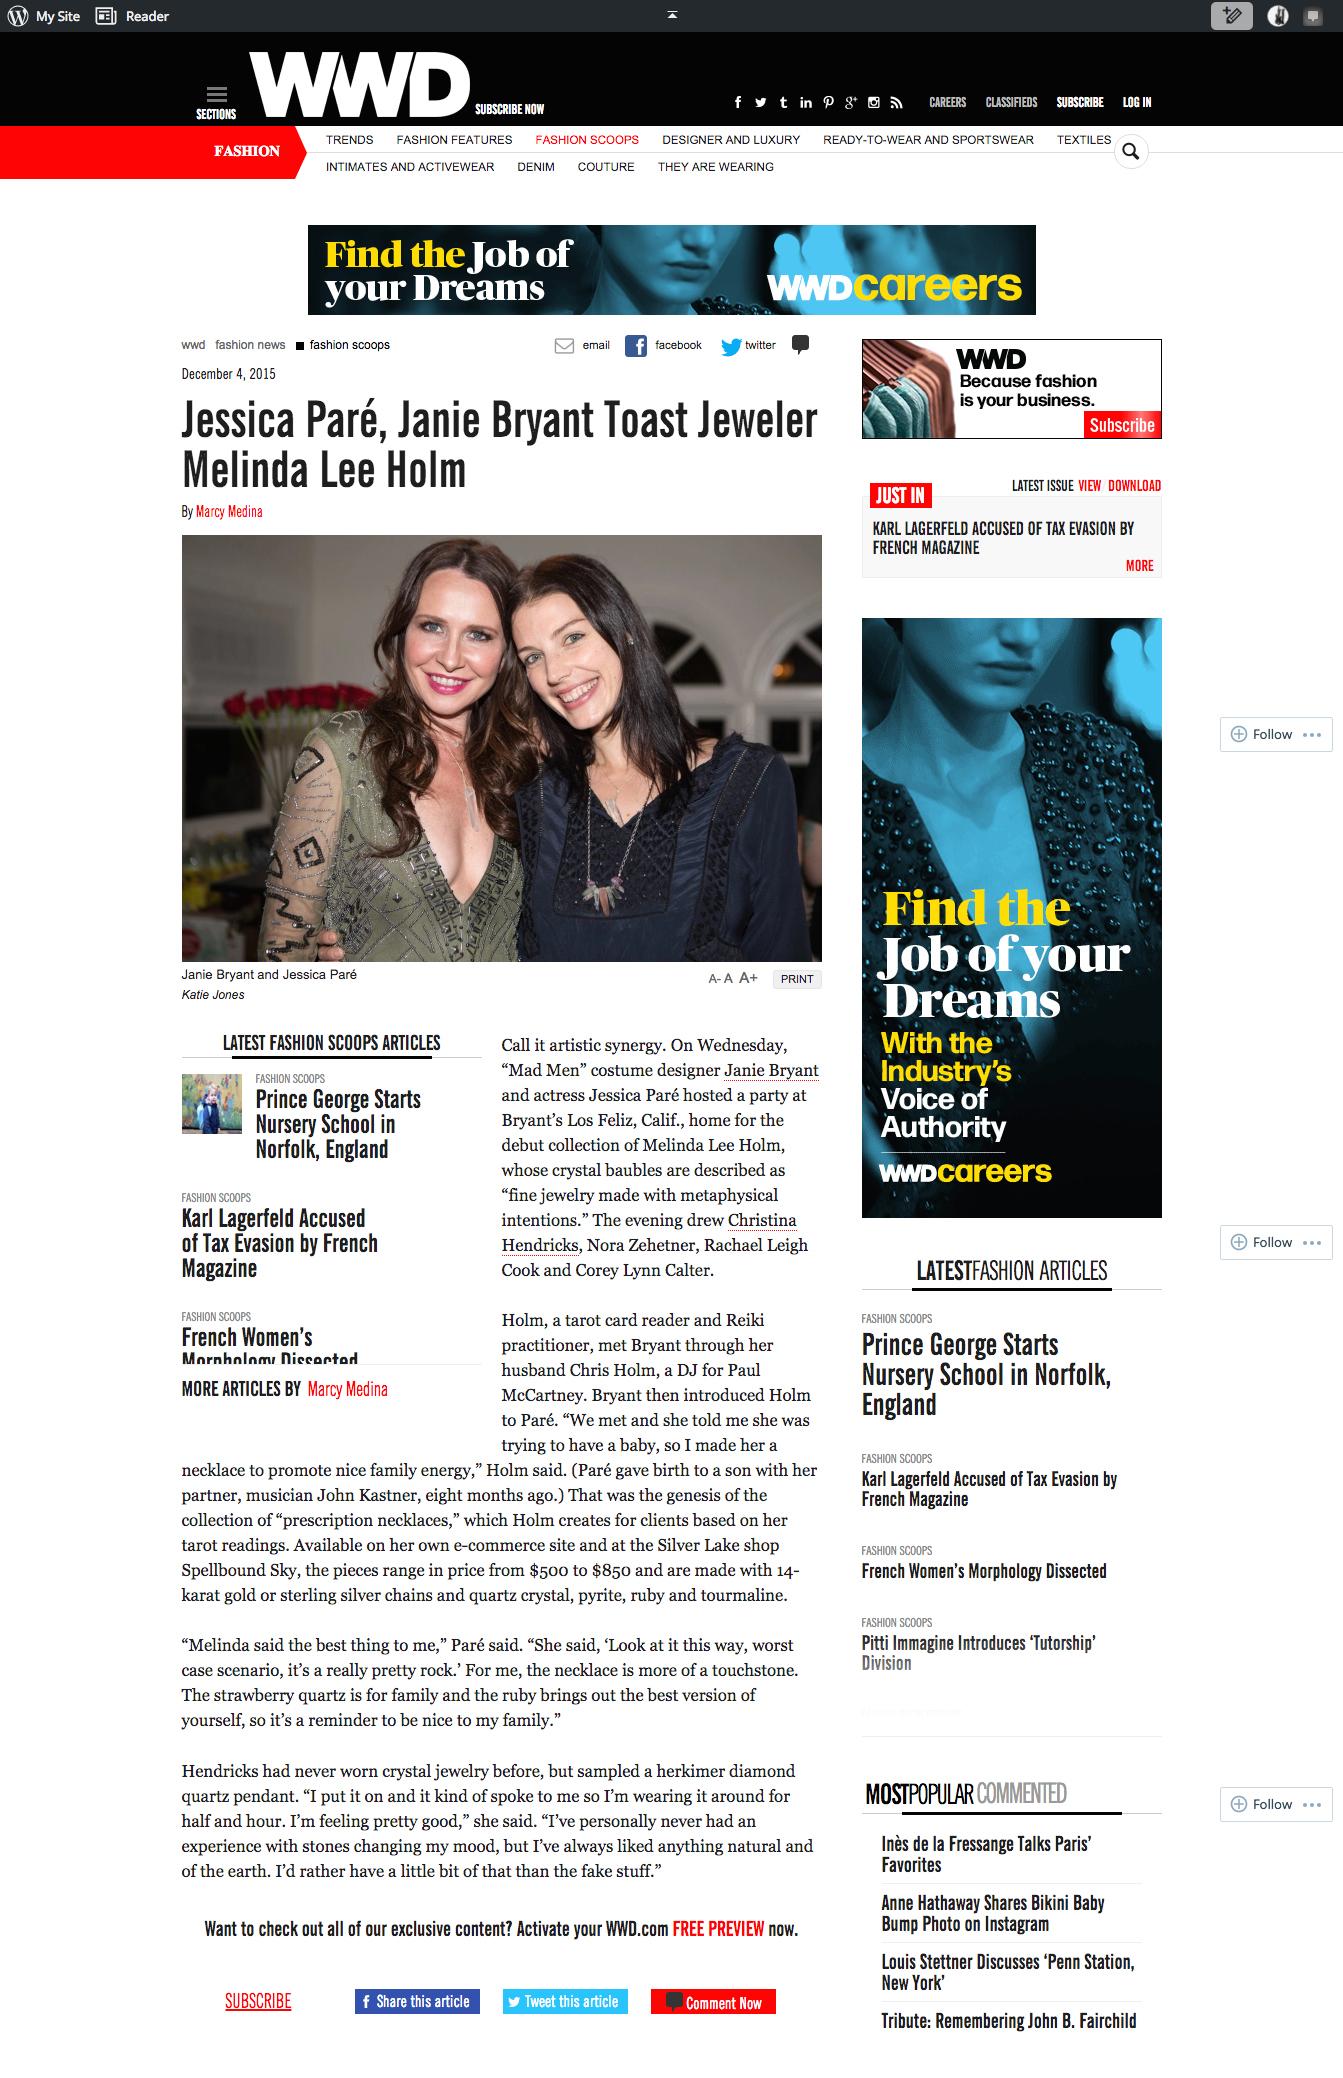 Jessica Paré, Janie Bryant Toast Jeweler Melinda Lee Holm   WWD.com December 4, 2015